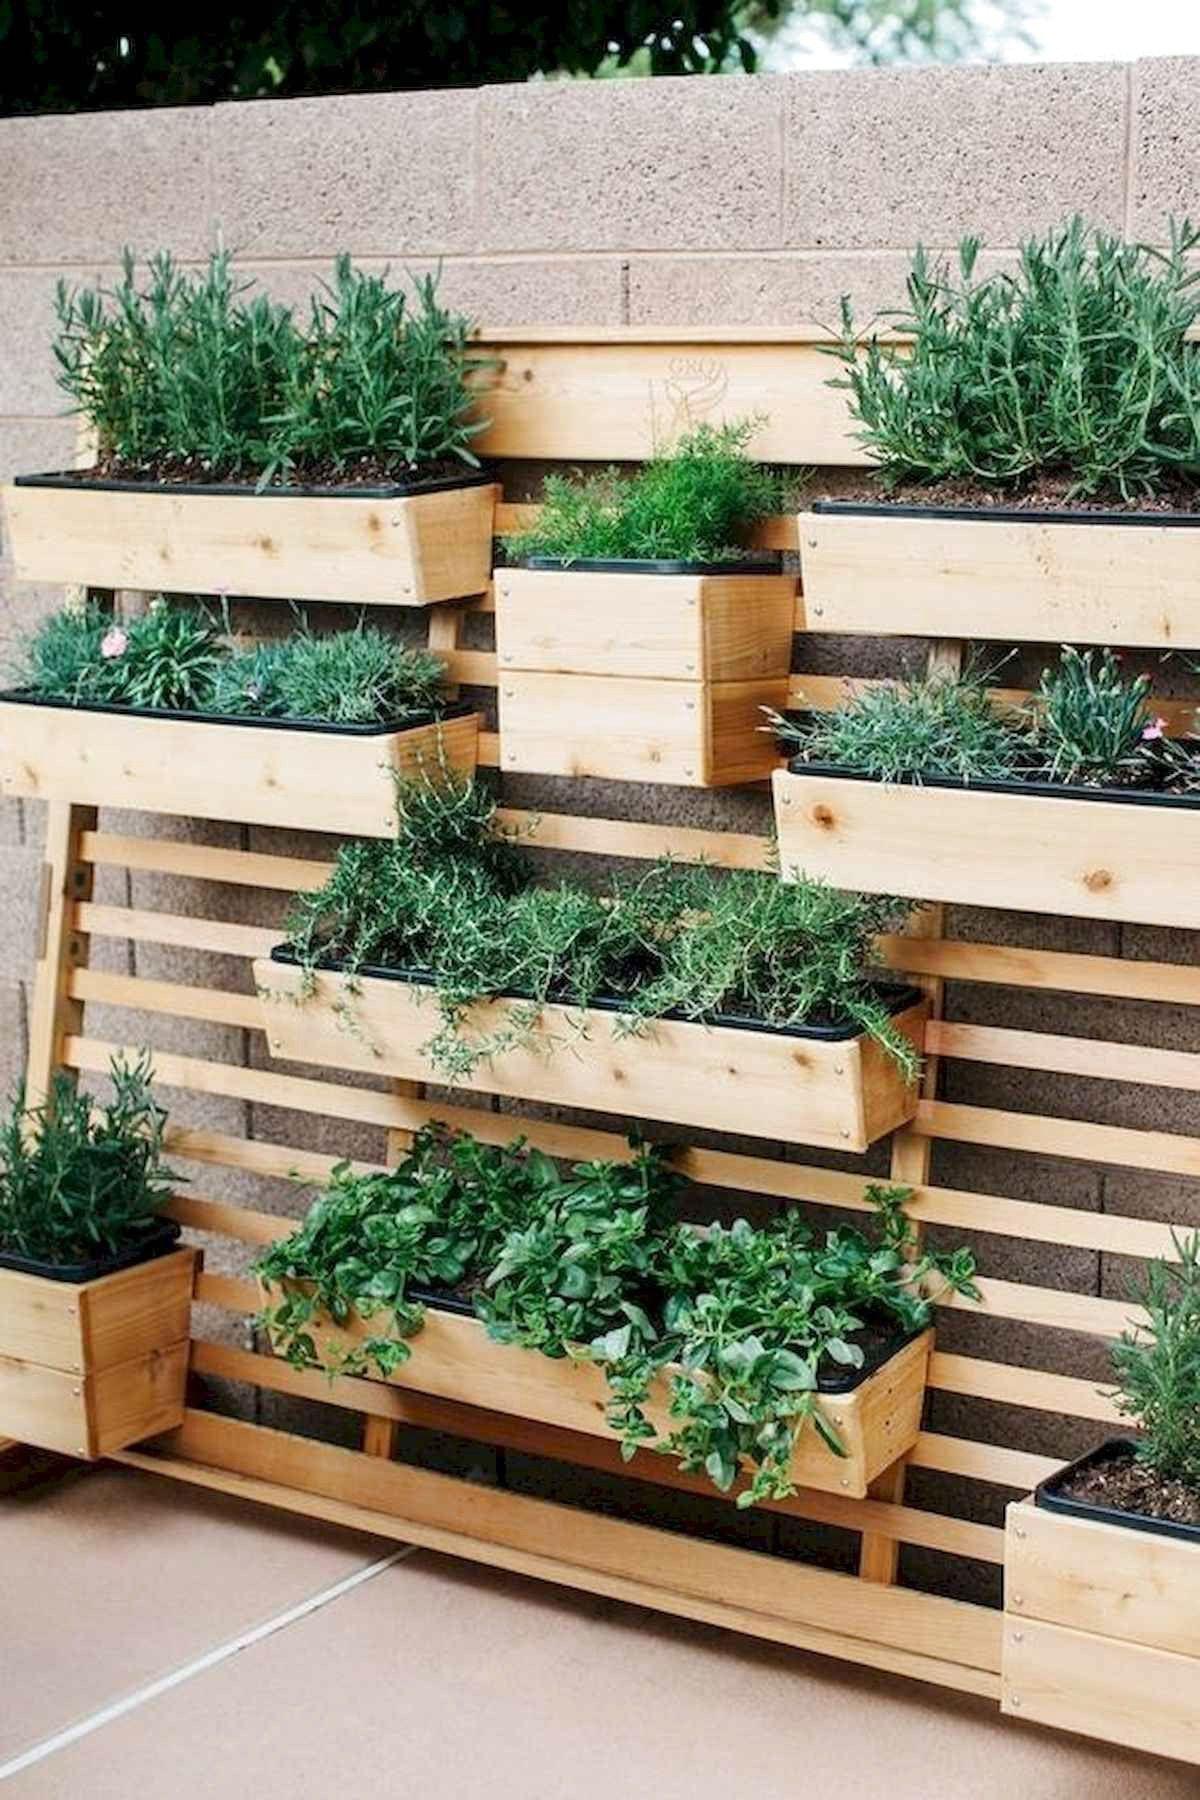 Inspiring Diy Projects Pallet Garden Design Ideas Frugal Living Vertical Garden Diy Vertical Garden Design Small Backyard Gardens